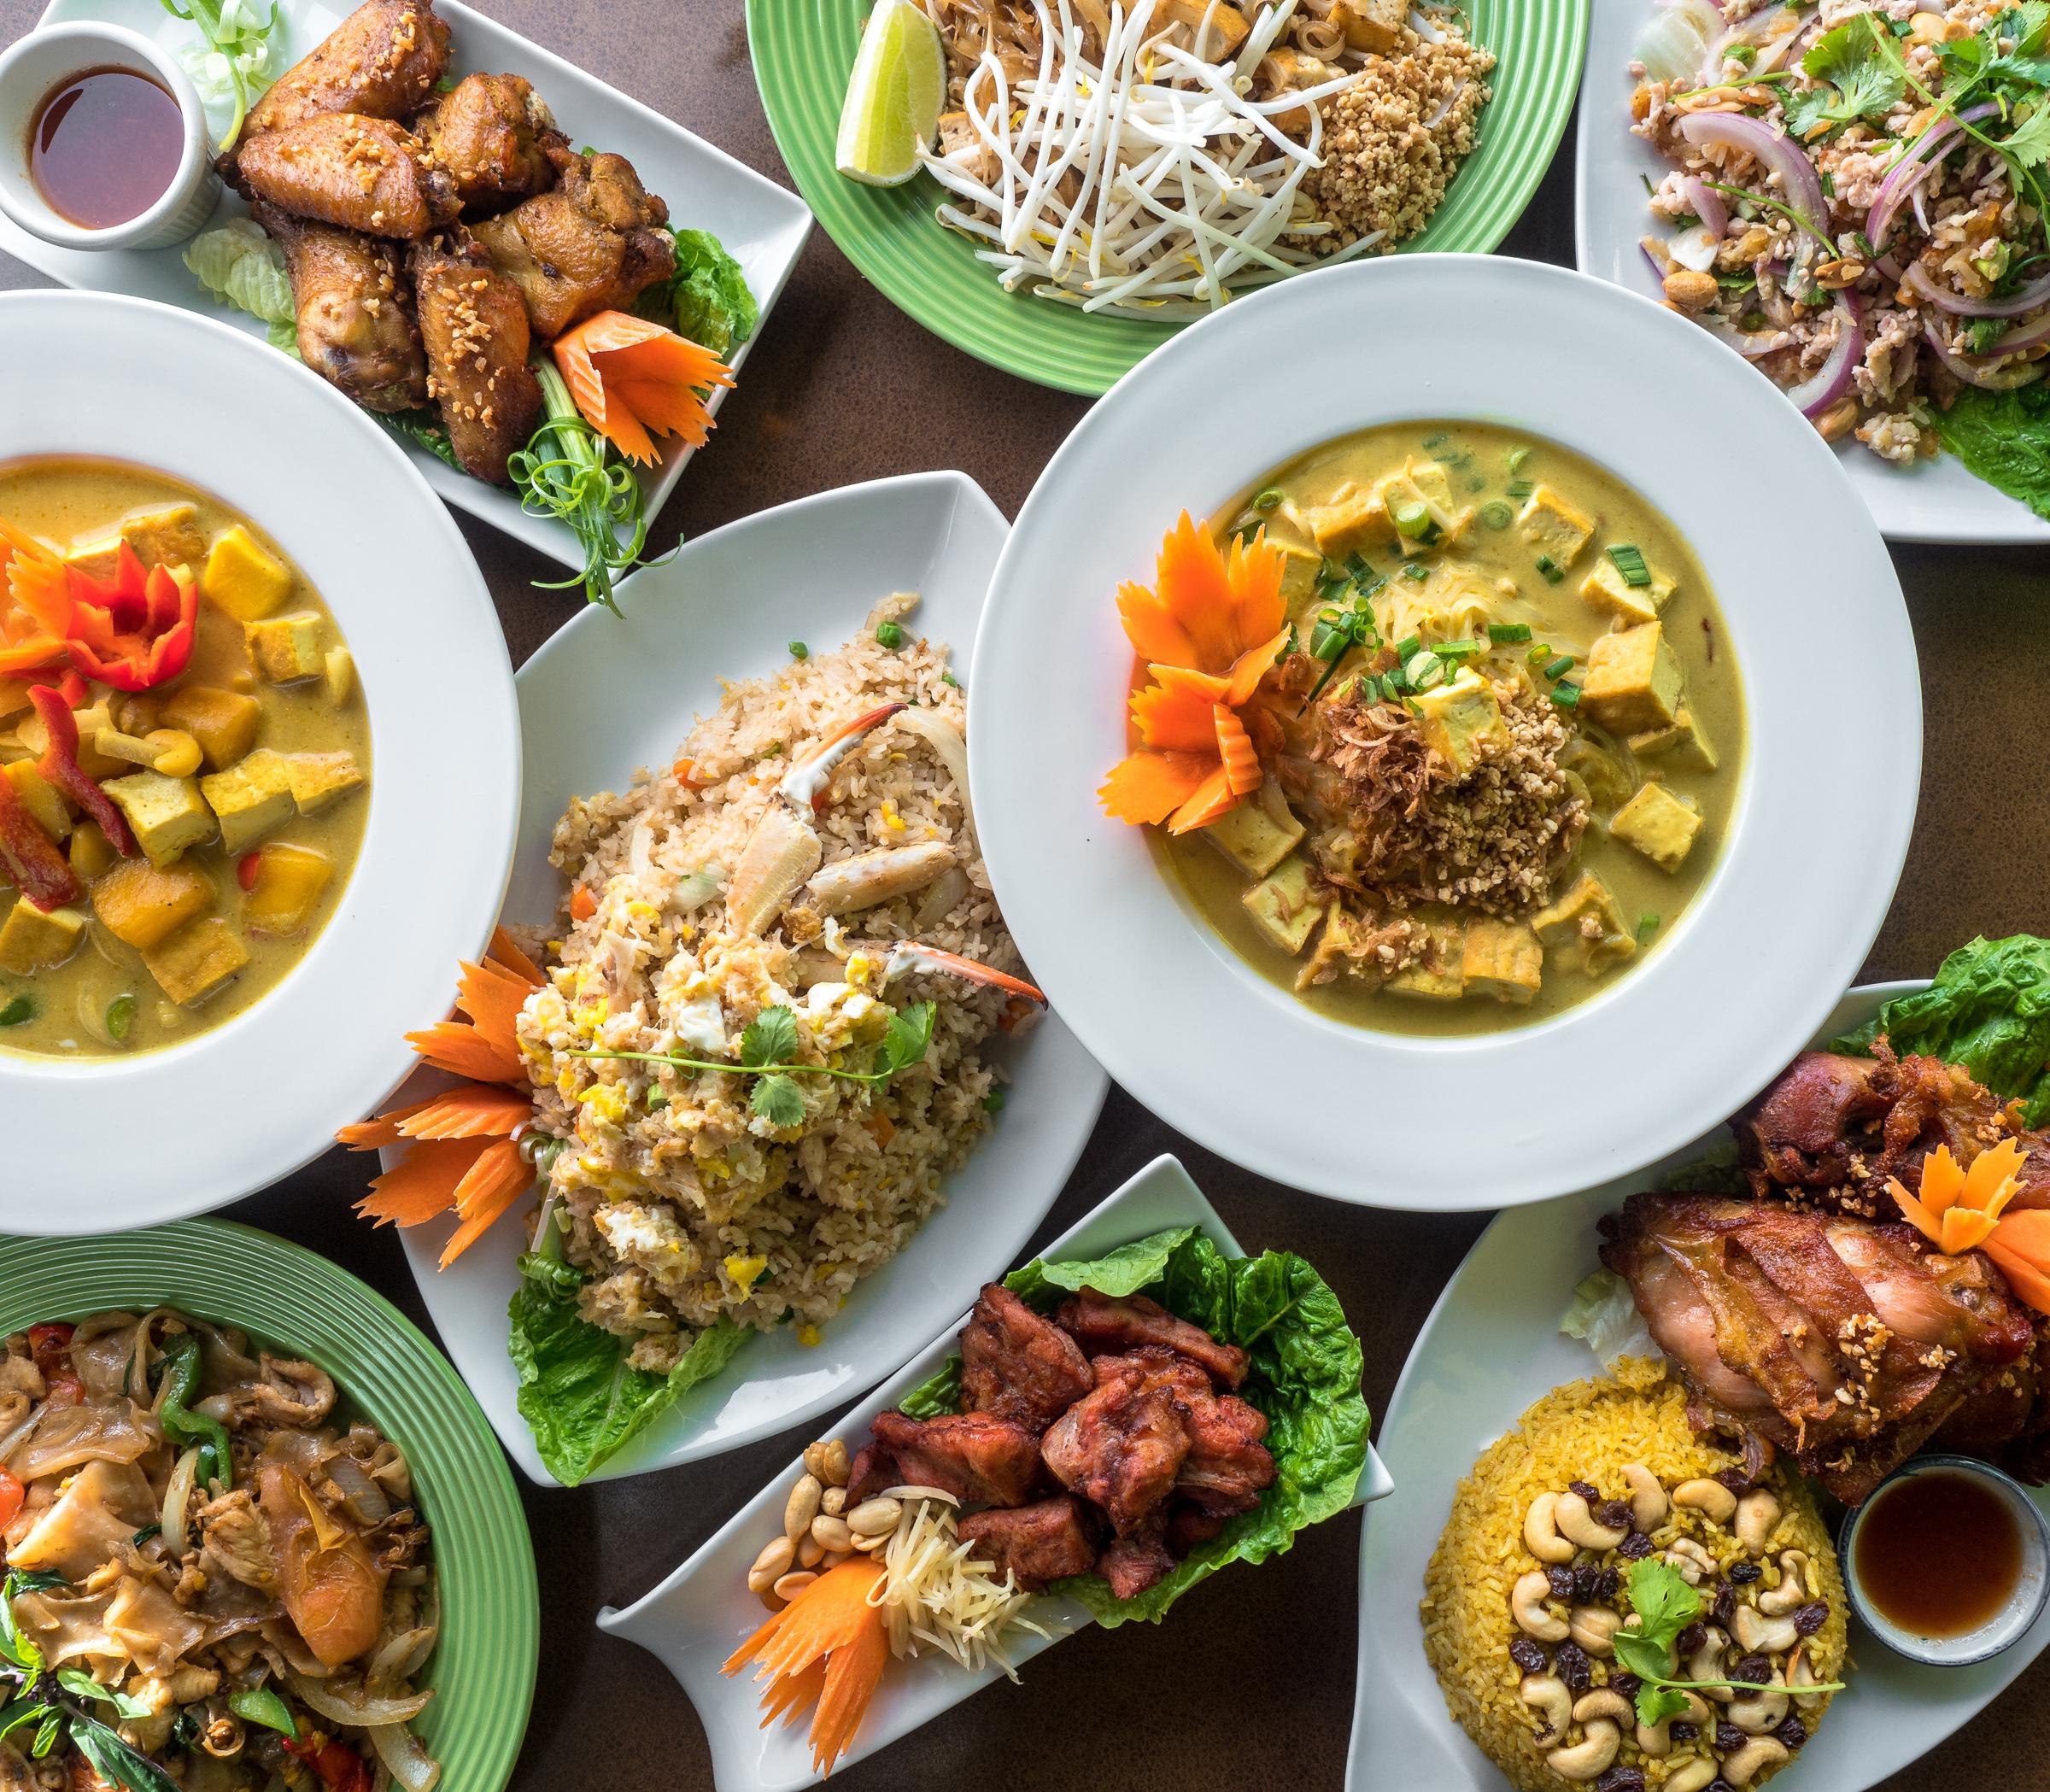 classic thai cuisine jeremy pawlowski portland oregon texas food photographer photography restaurant menu